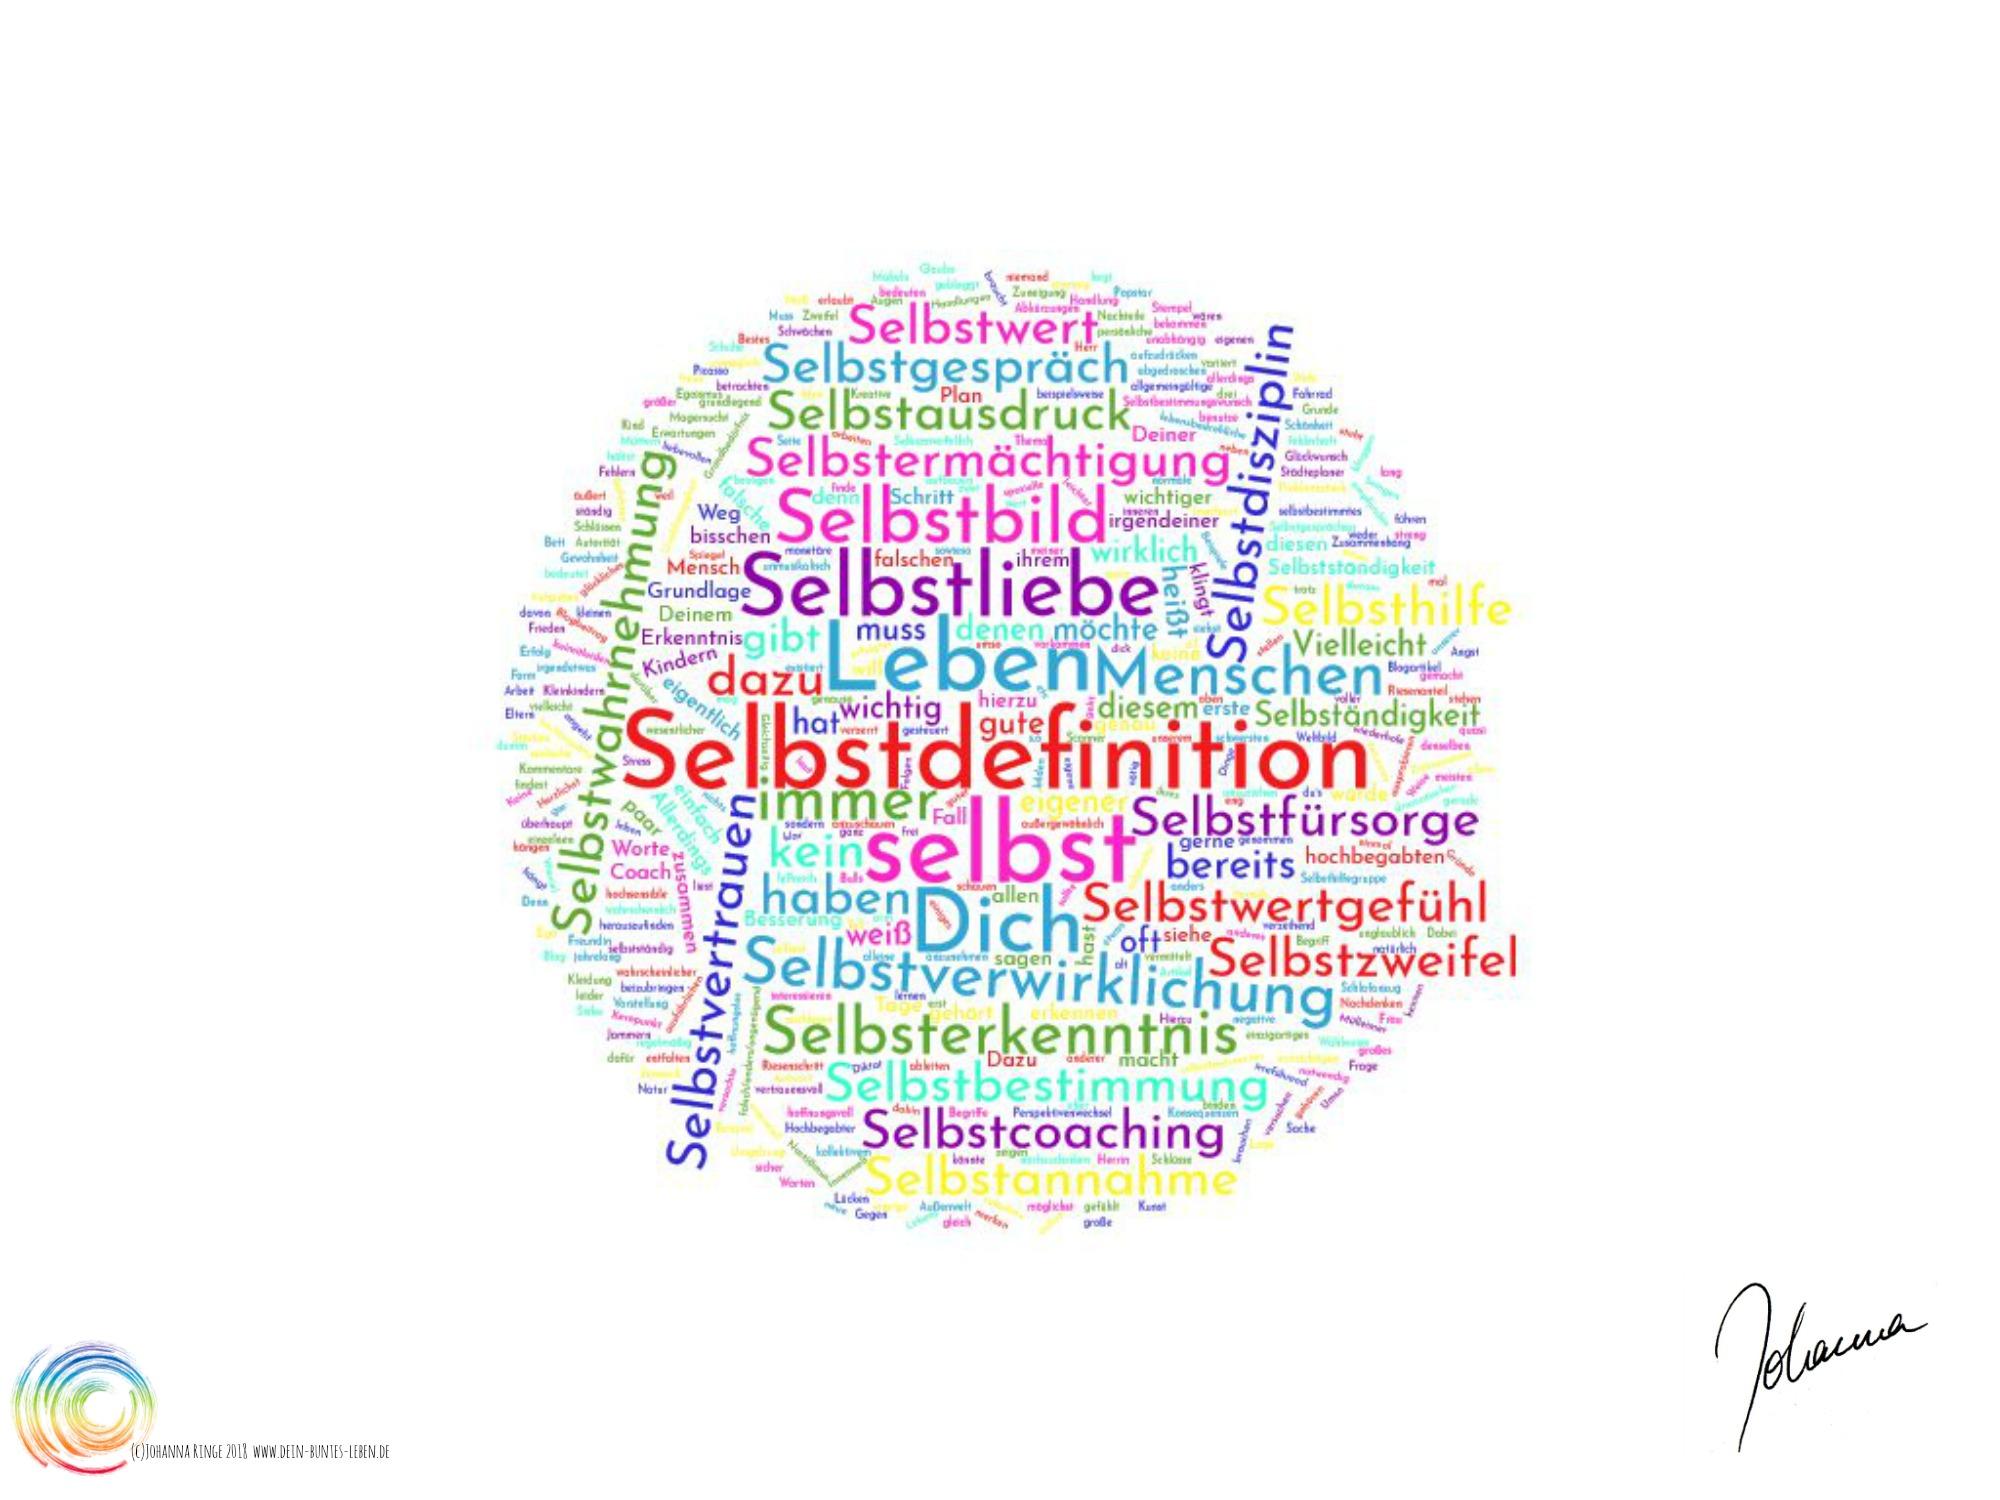 Selbstdefinition als kreisförmige Wörterwolke (c) 2018 Johanna Ringe www.dein-buntes-leben.de